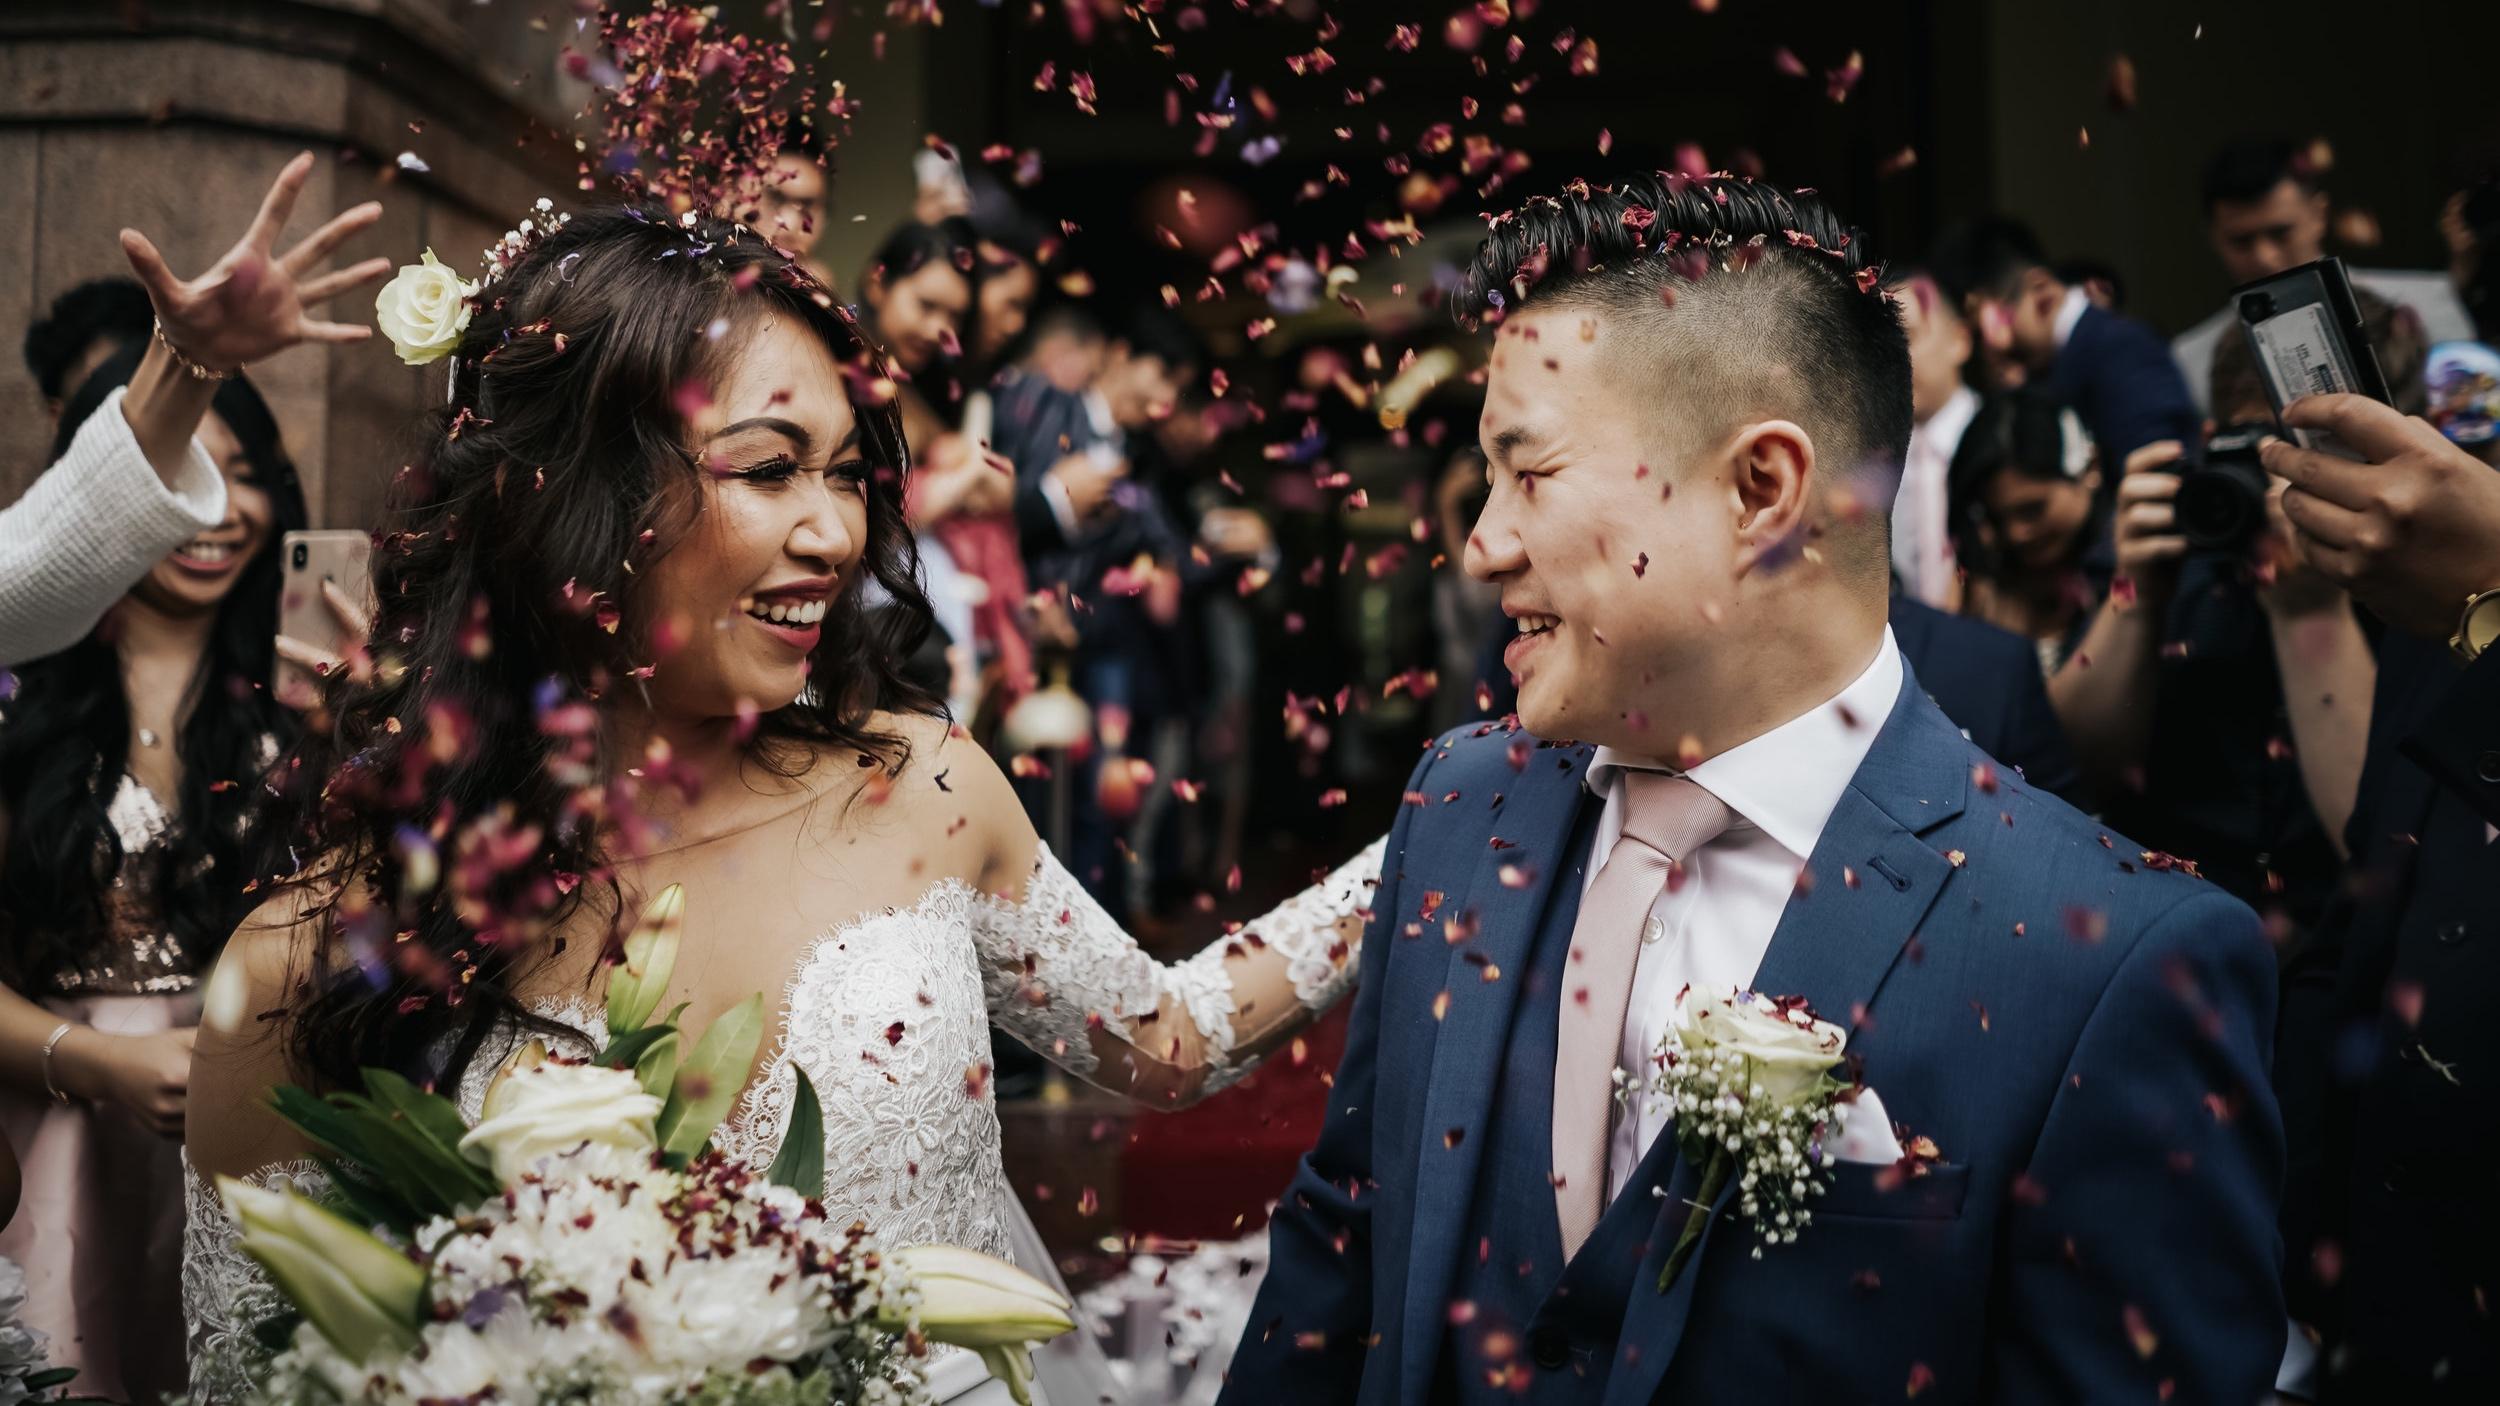 Chinese+Wedding+Photography+Manchester+wedding+photographer+Cheshire+-+021.jpg